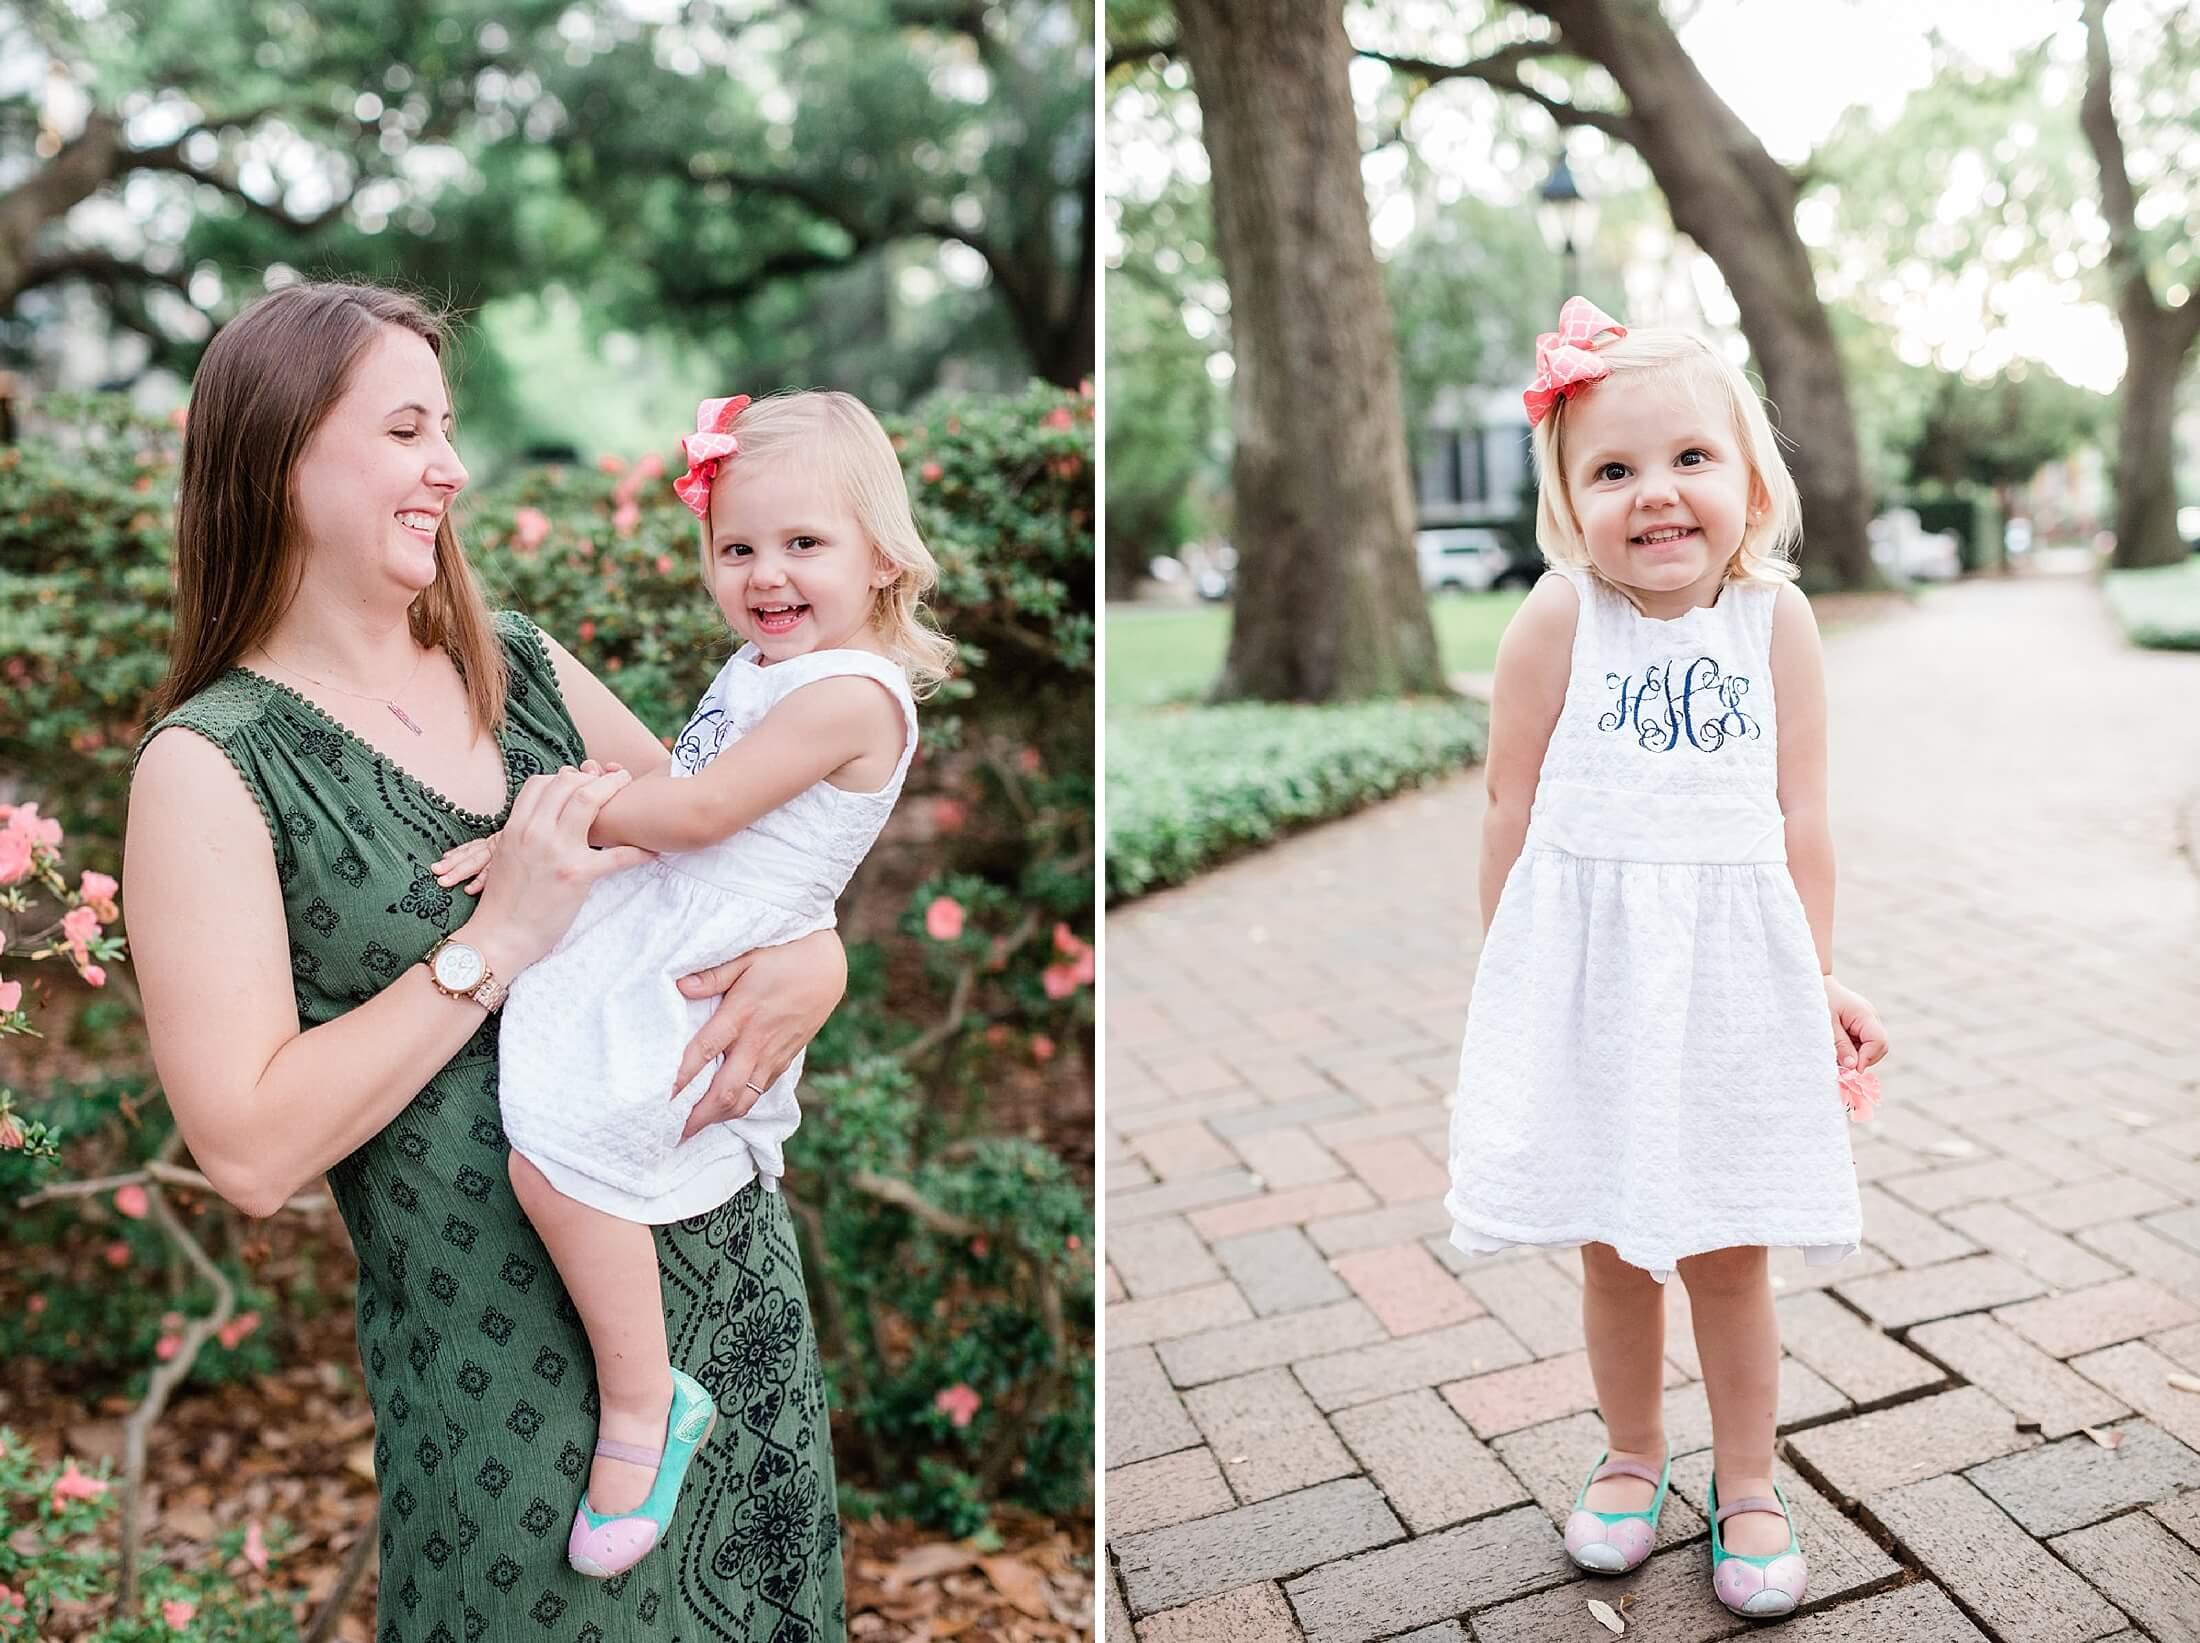 Apt-b-photography-savannah-engagement-photographer-savannah-family-kid-hilton-head-elopement-savannah-wedding-photographer-2.jpg